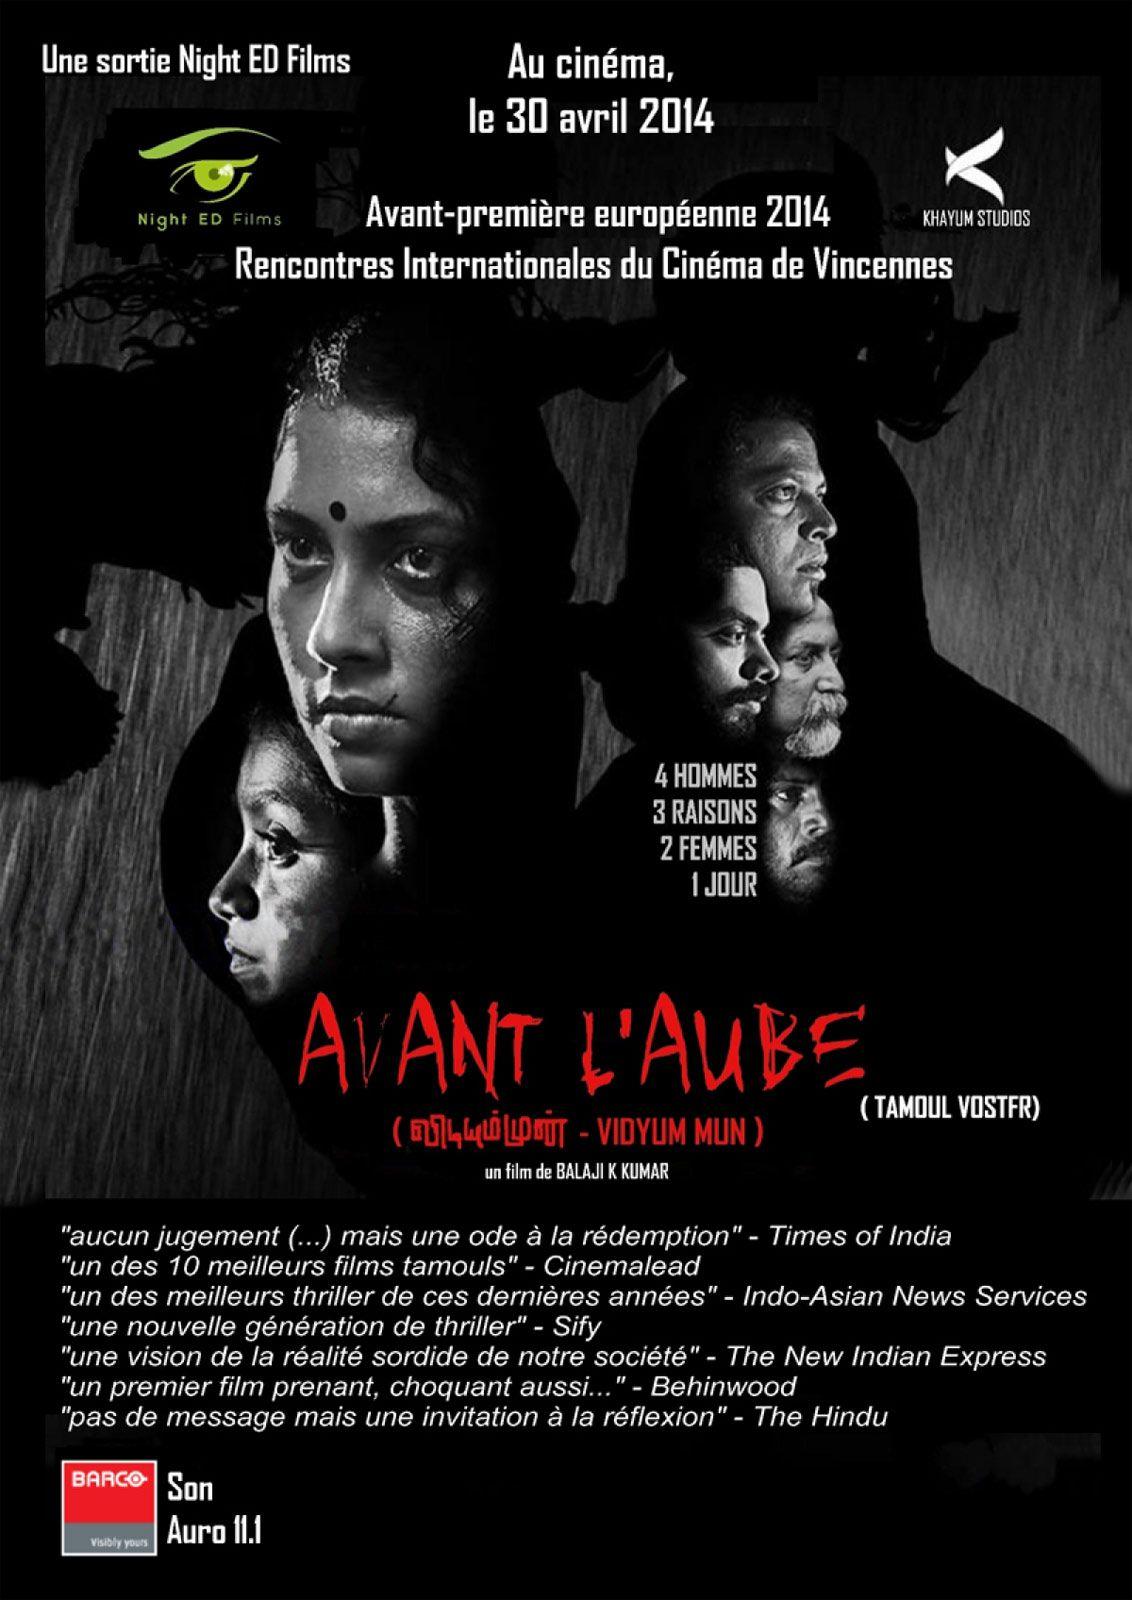 Avant l'aube - Film (2014)